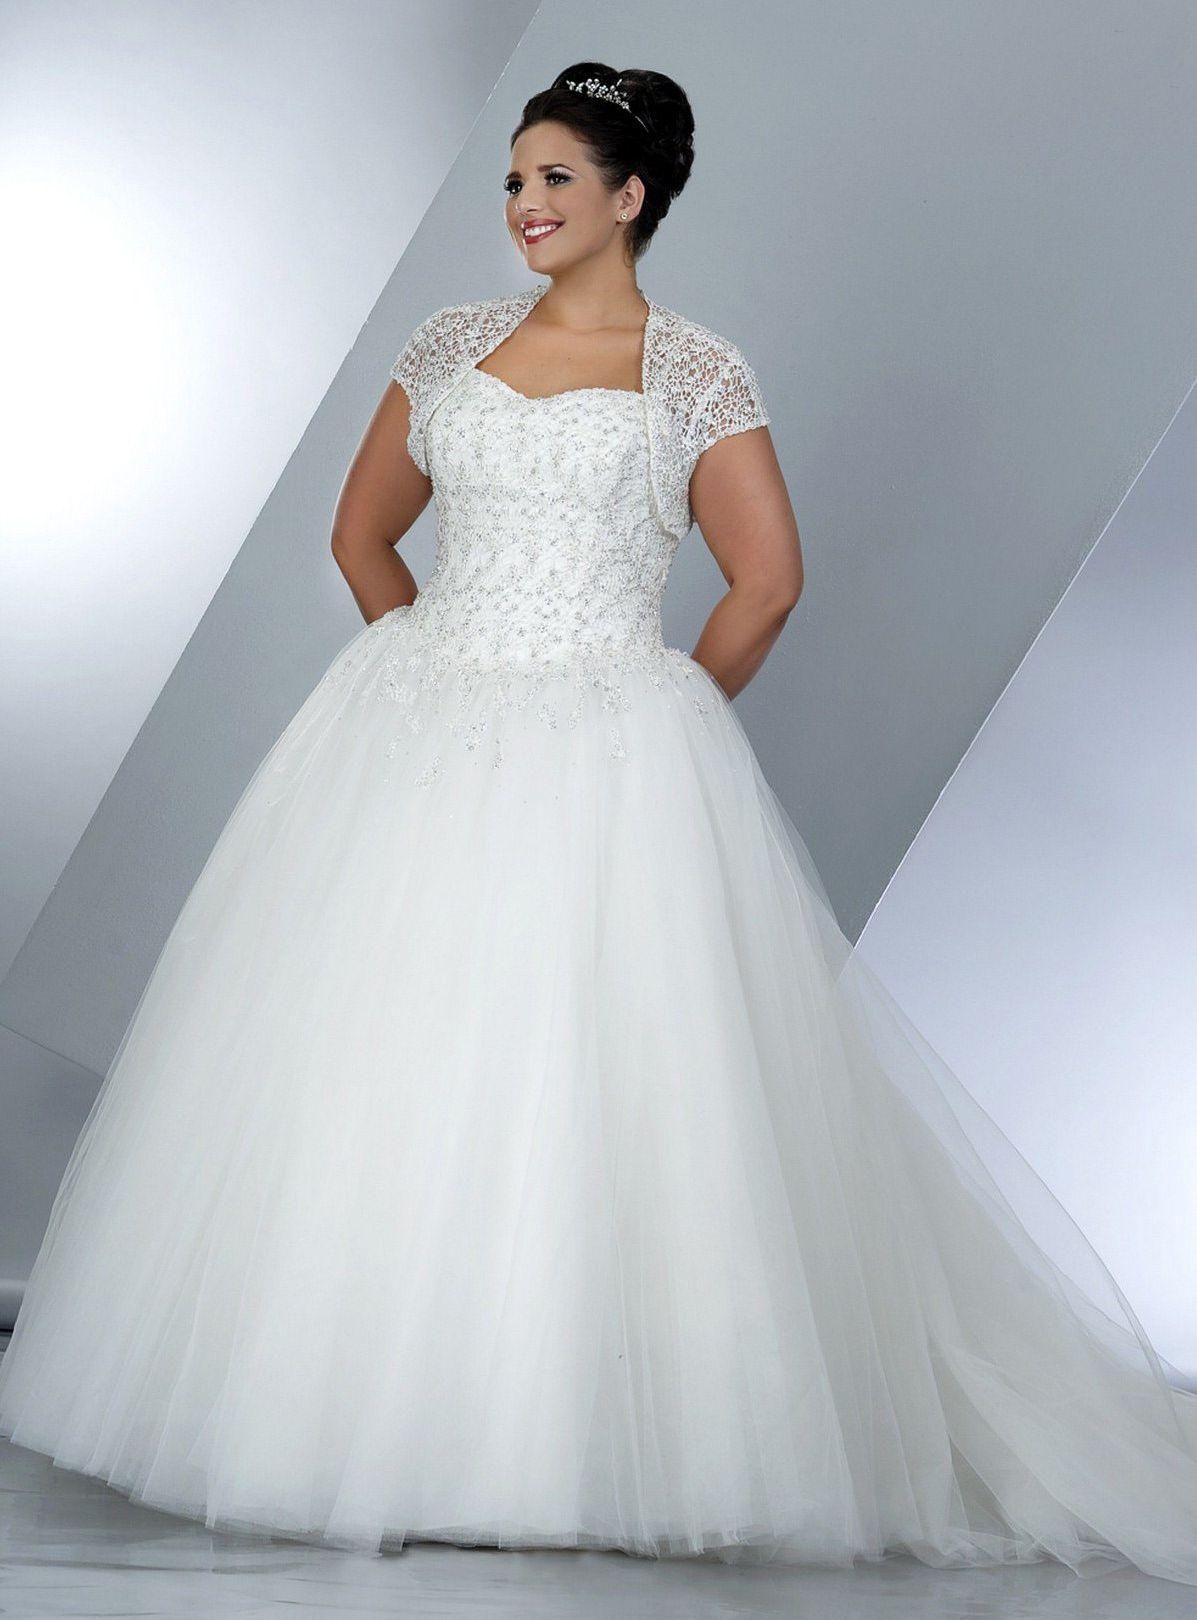 Cap sleeve plus size wedding gown weddings ballgowns